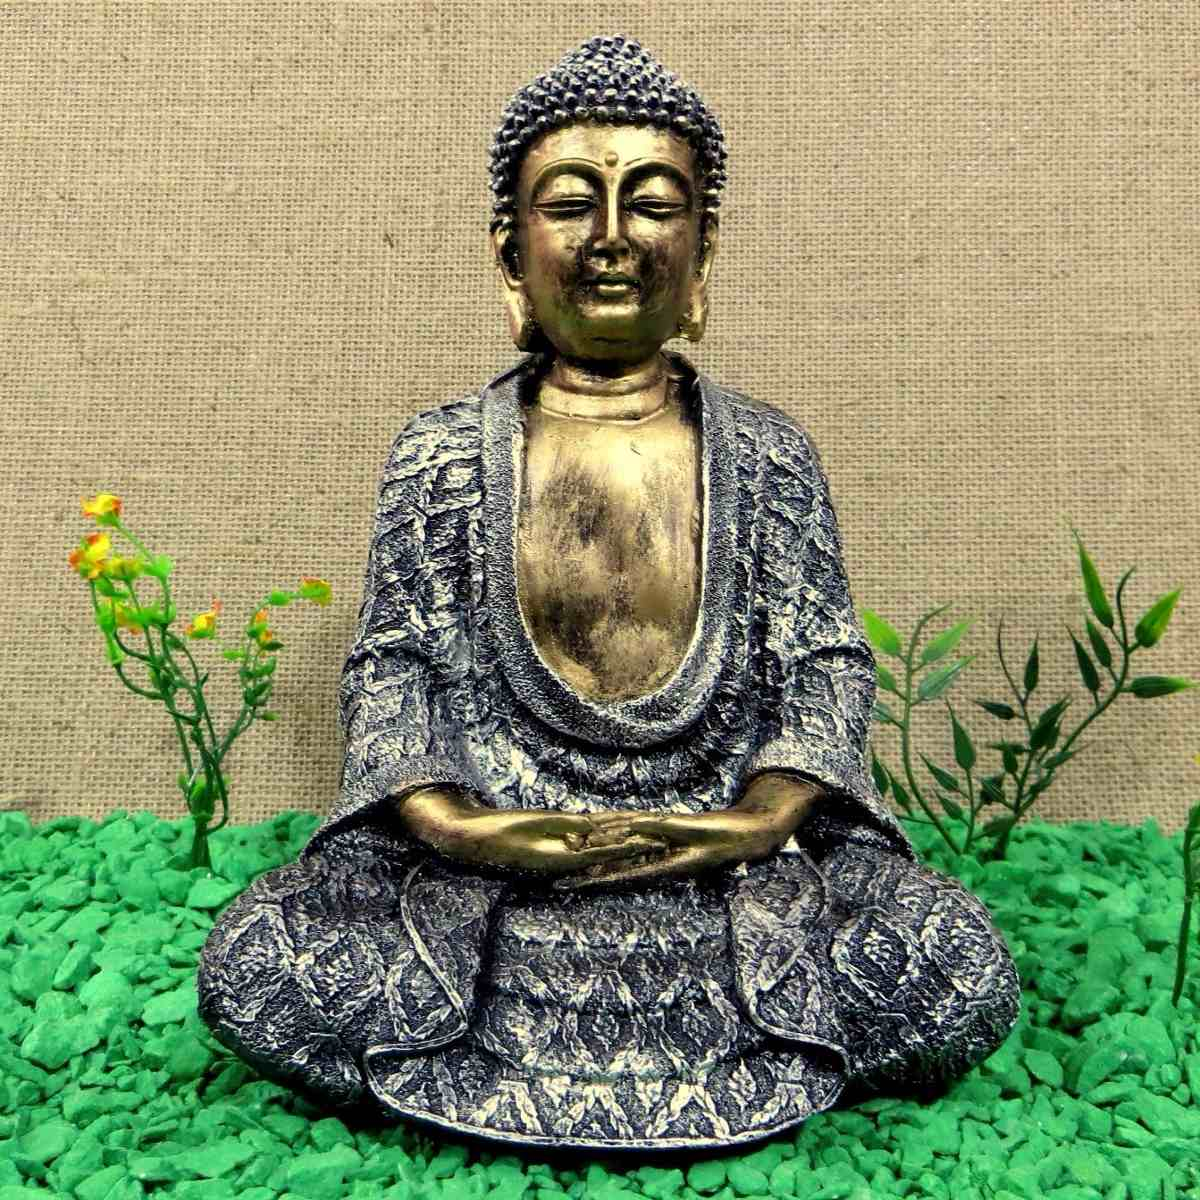 buda hindu tailandes estatueta decorativo em resina r On buda tailandes